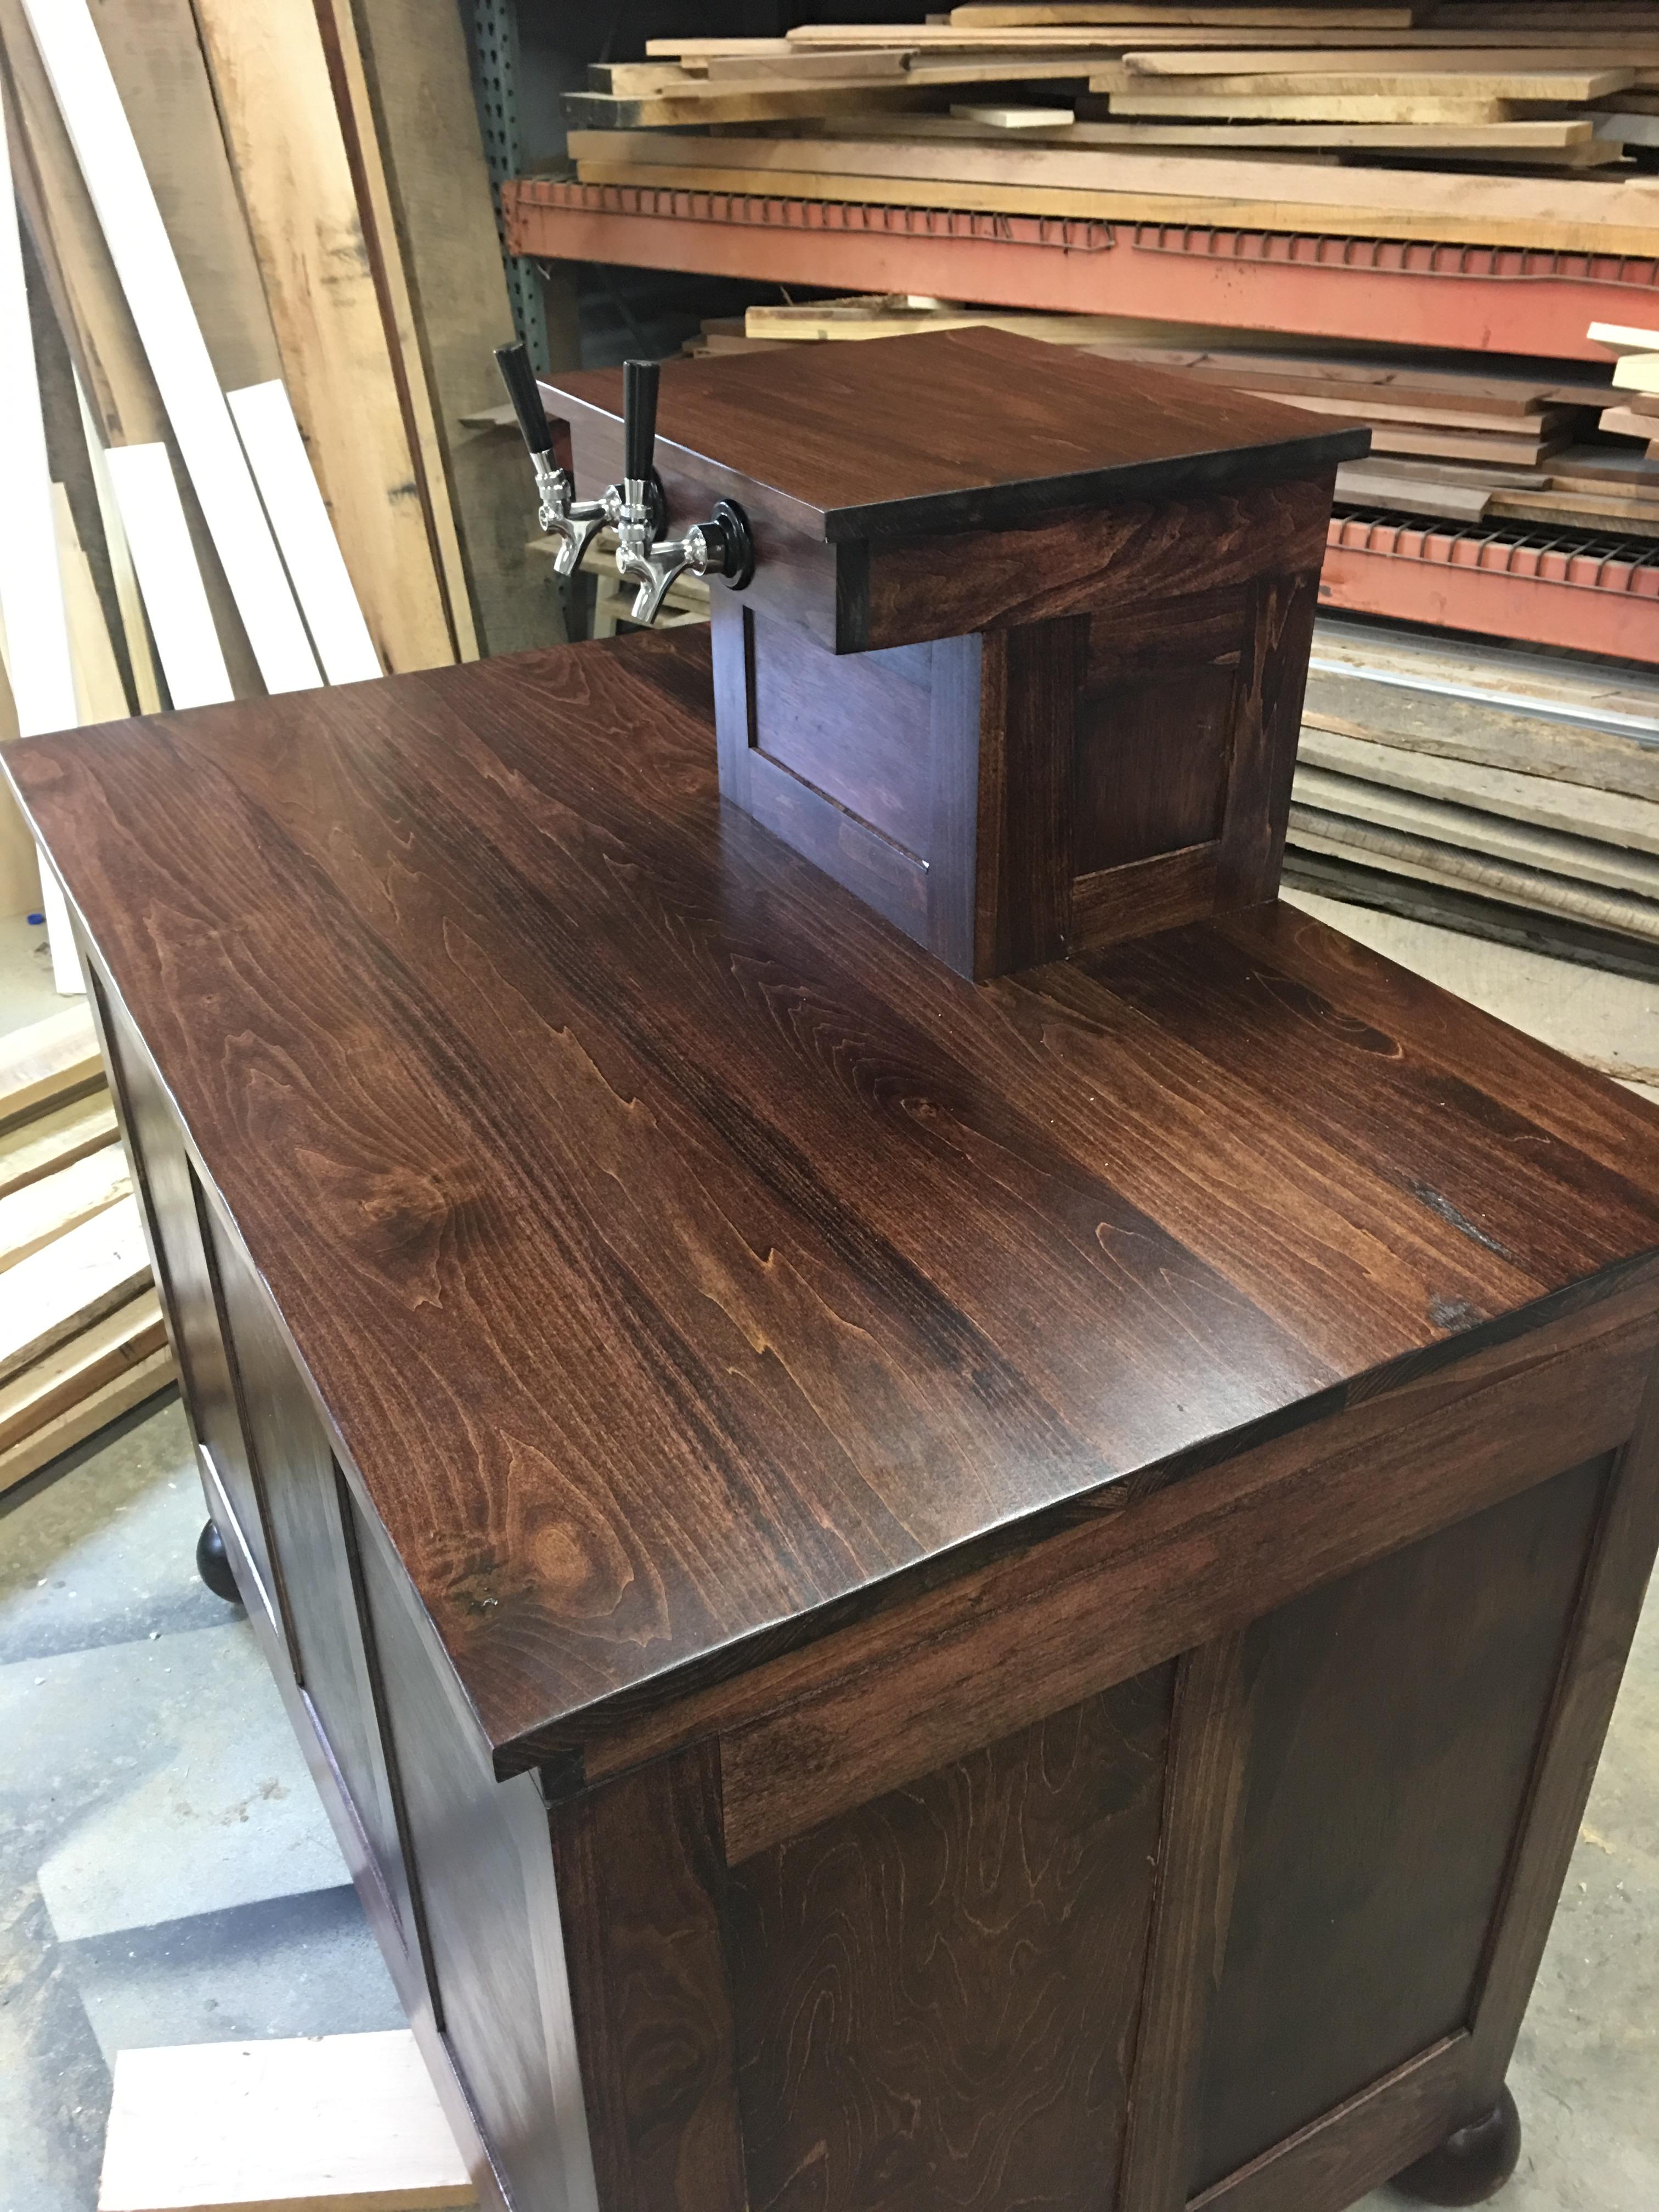 ... Kegerator, Beer Coolers, Dispensers, Custom Made Kegerators, 5th  Anniversary Wood Gift Custom Made Kegerator Cabinet ...